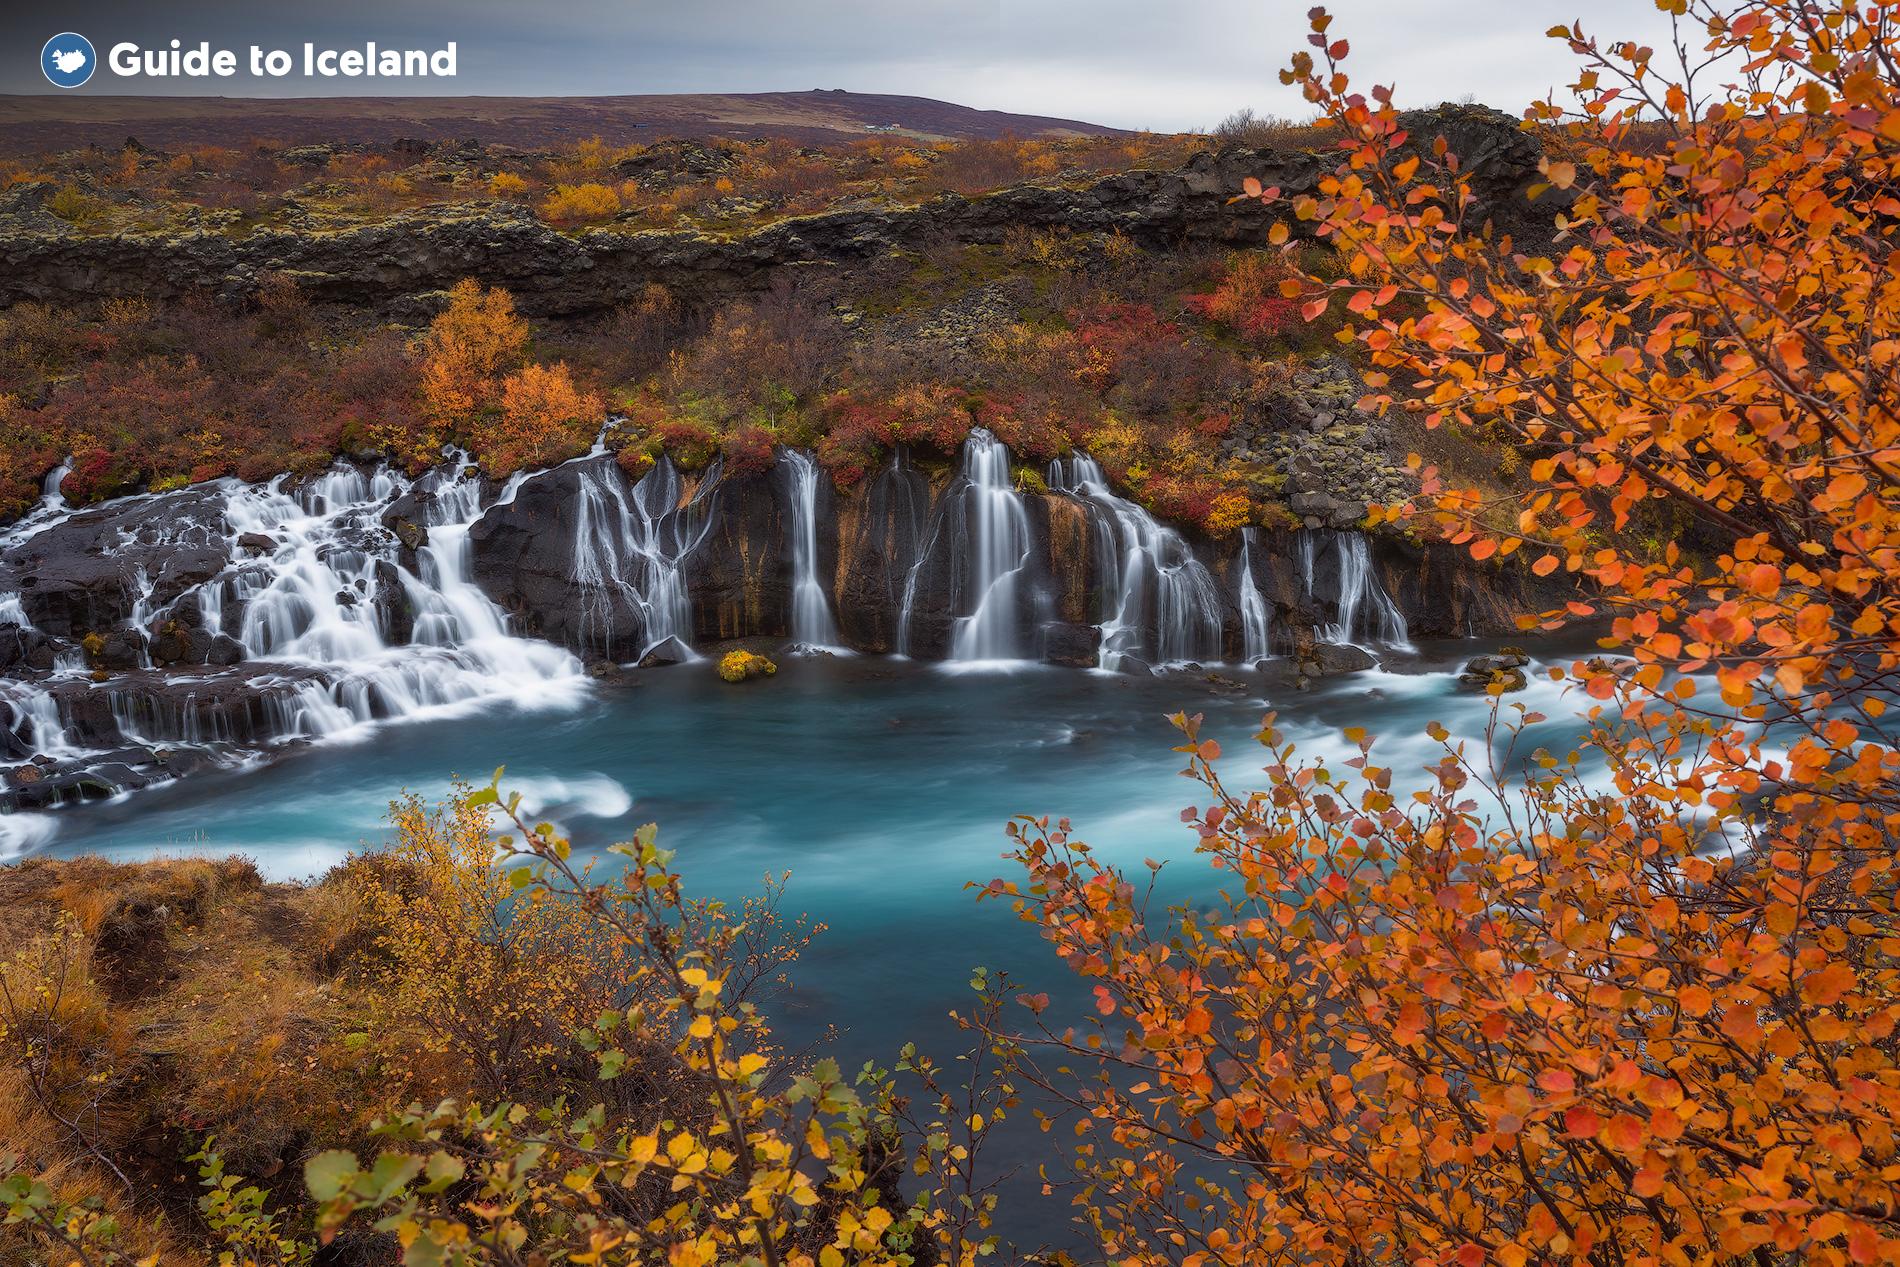 Hraunfossar赫伦瀑布被冰岛秋季的黄叶包围时景致十分动人